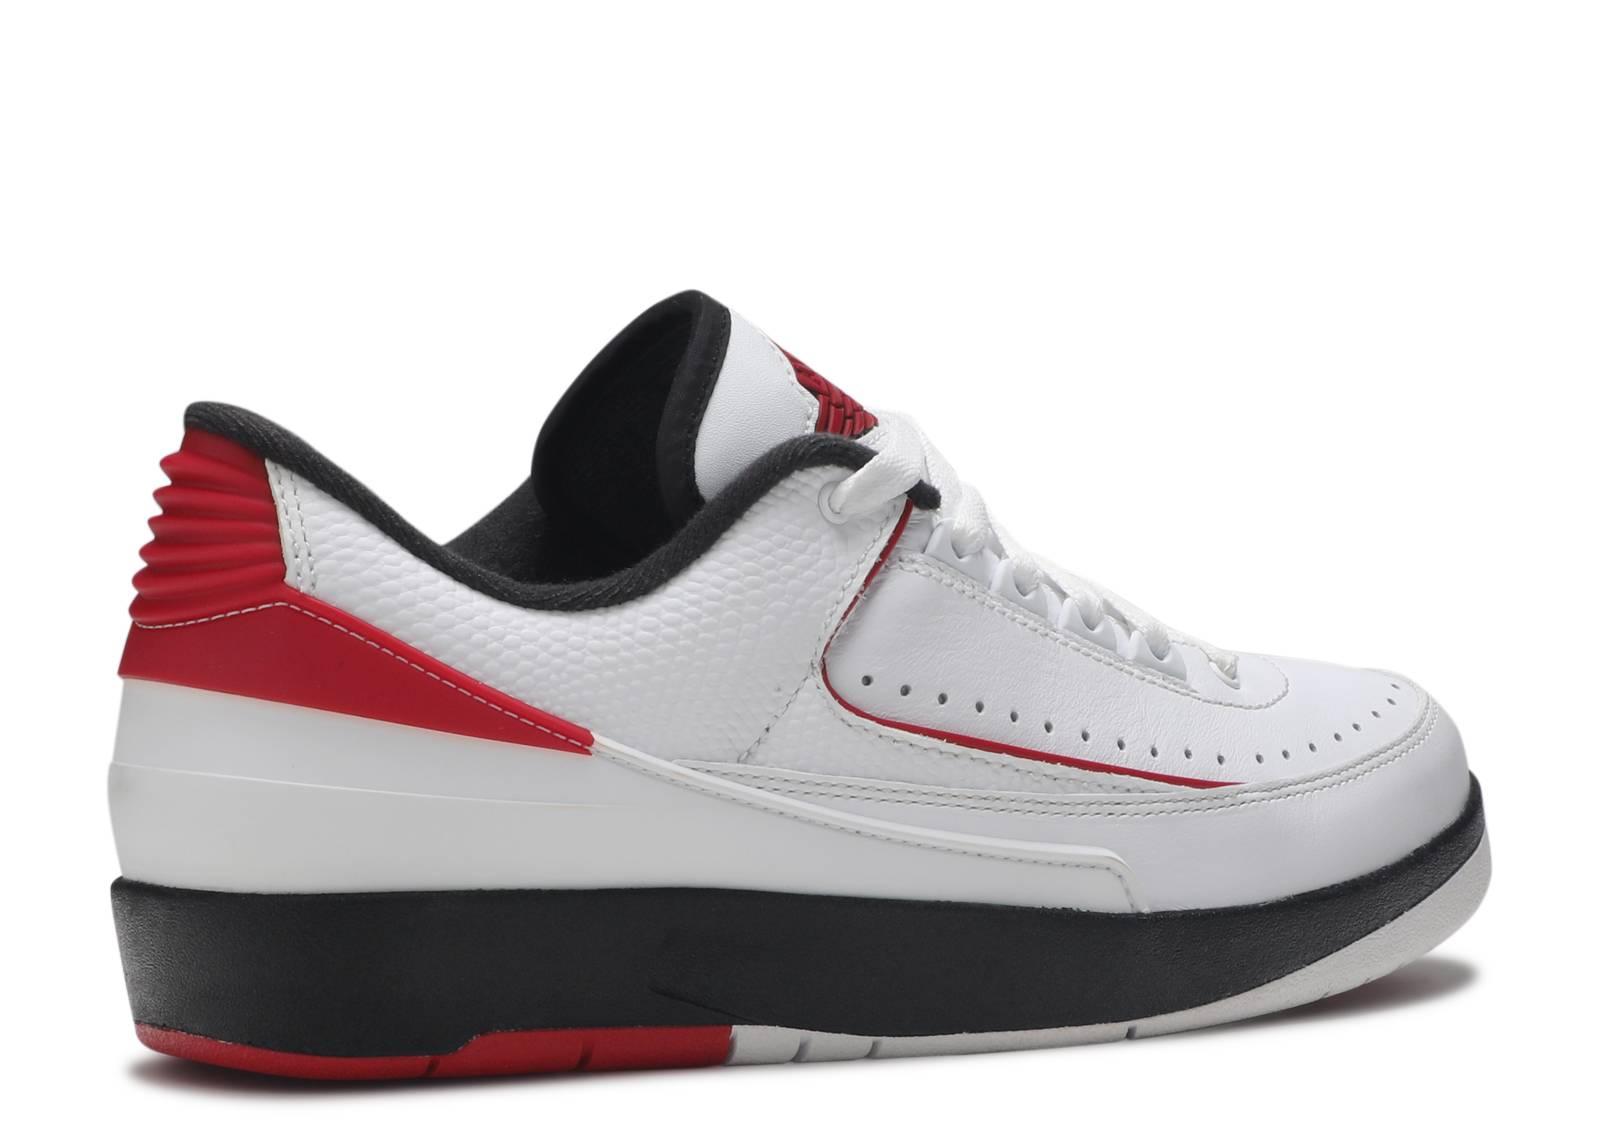 sale retailer 721aa 80d22 air jordan 2 low red orange sneakerdiscount